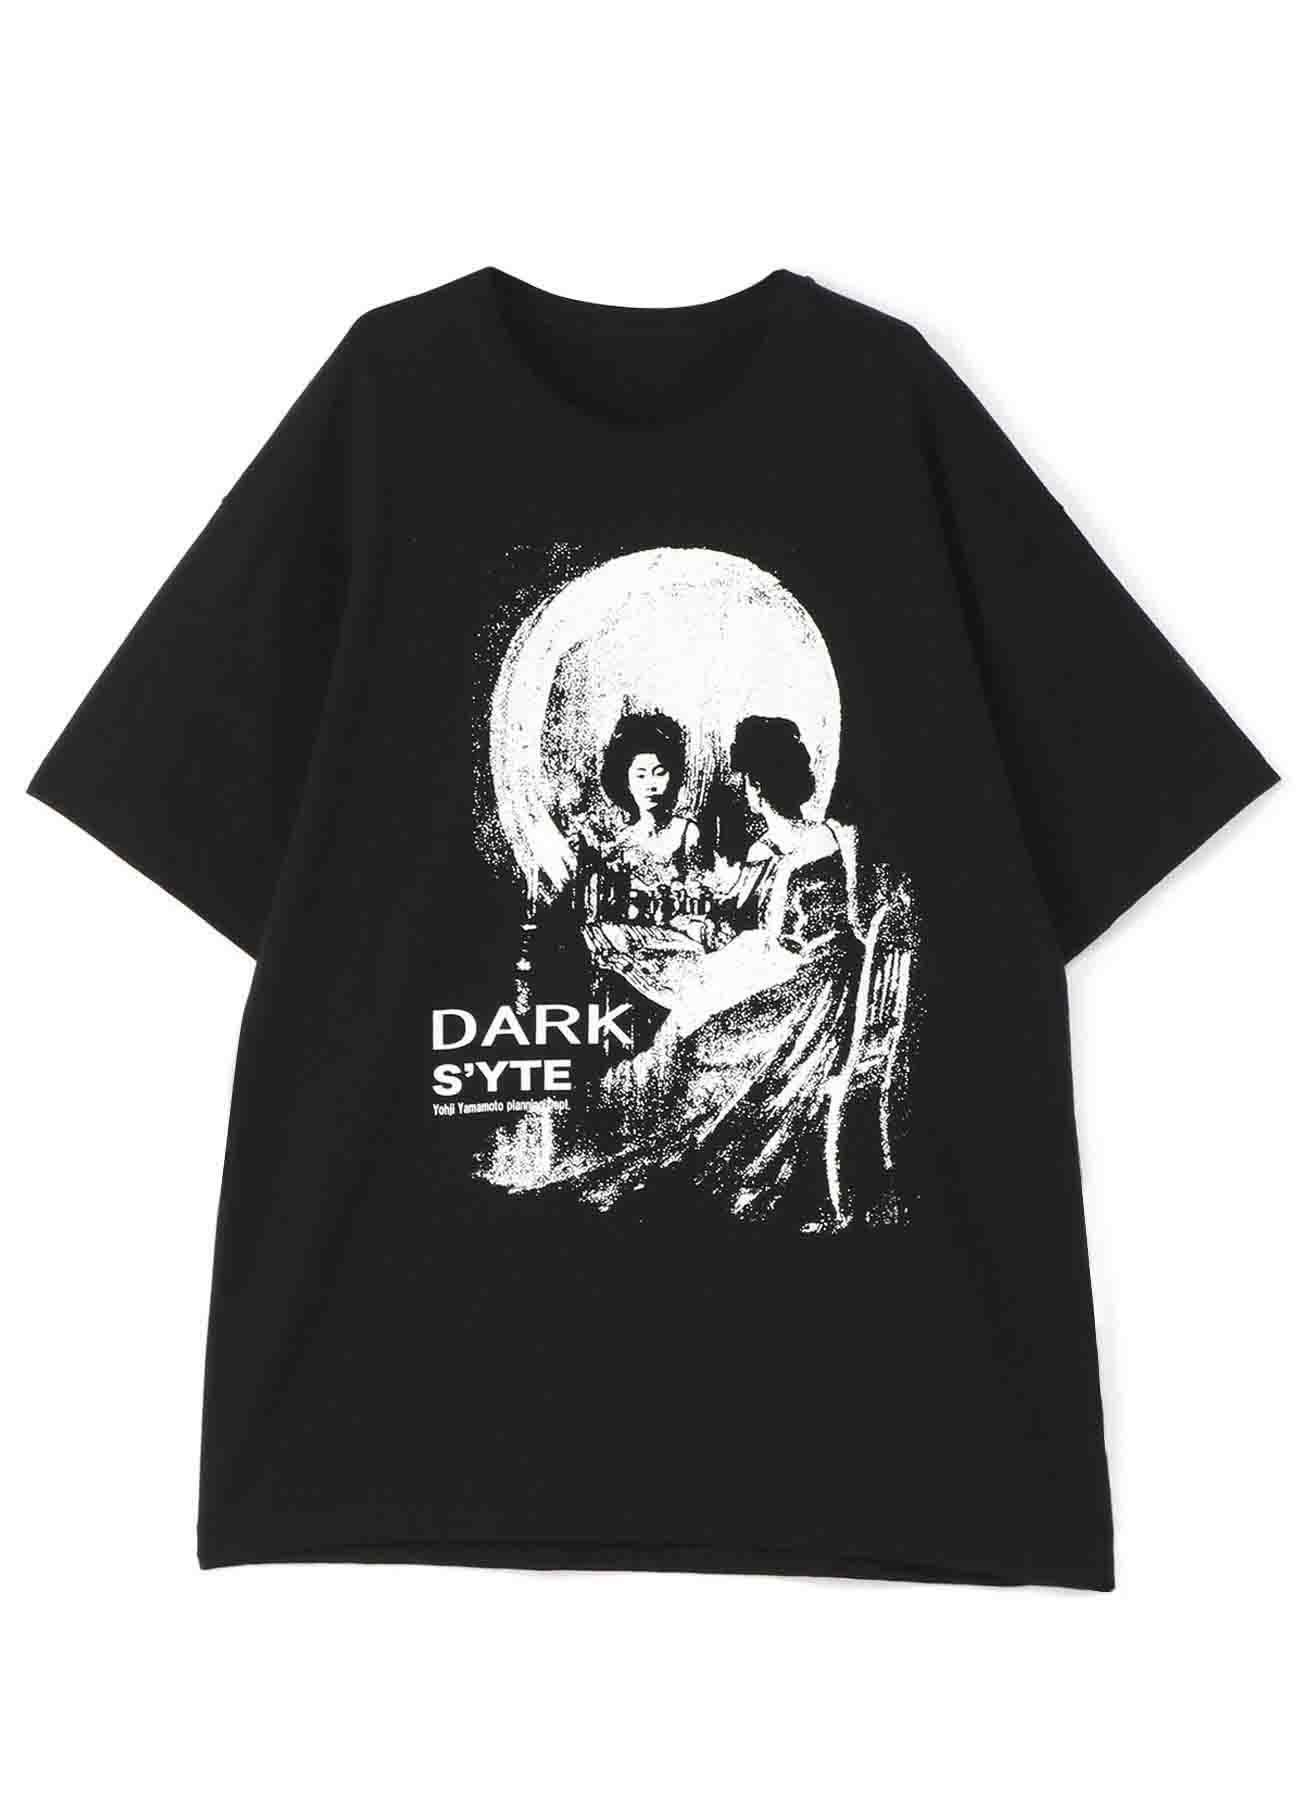 20/CottonJersey DarkS'YTE FakeT-shirt